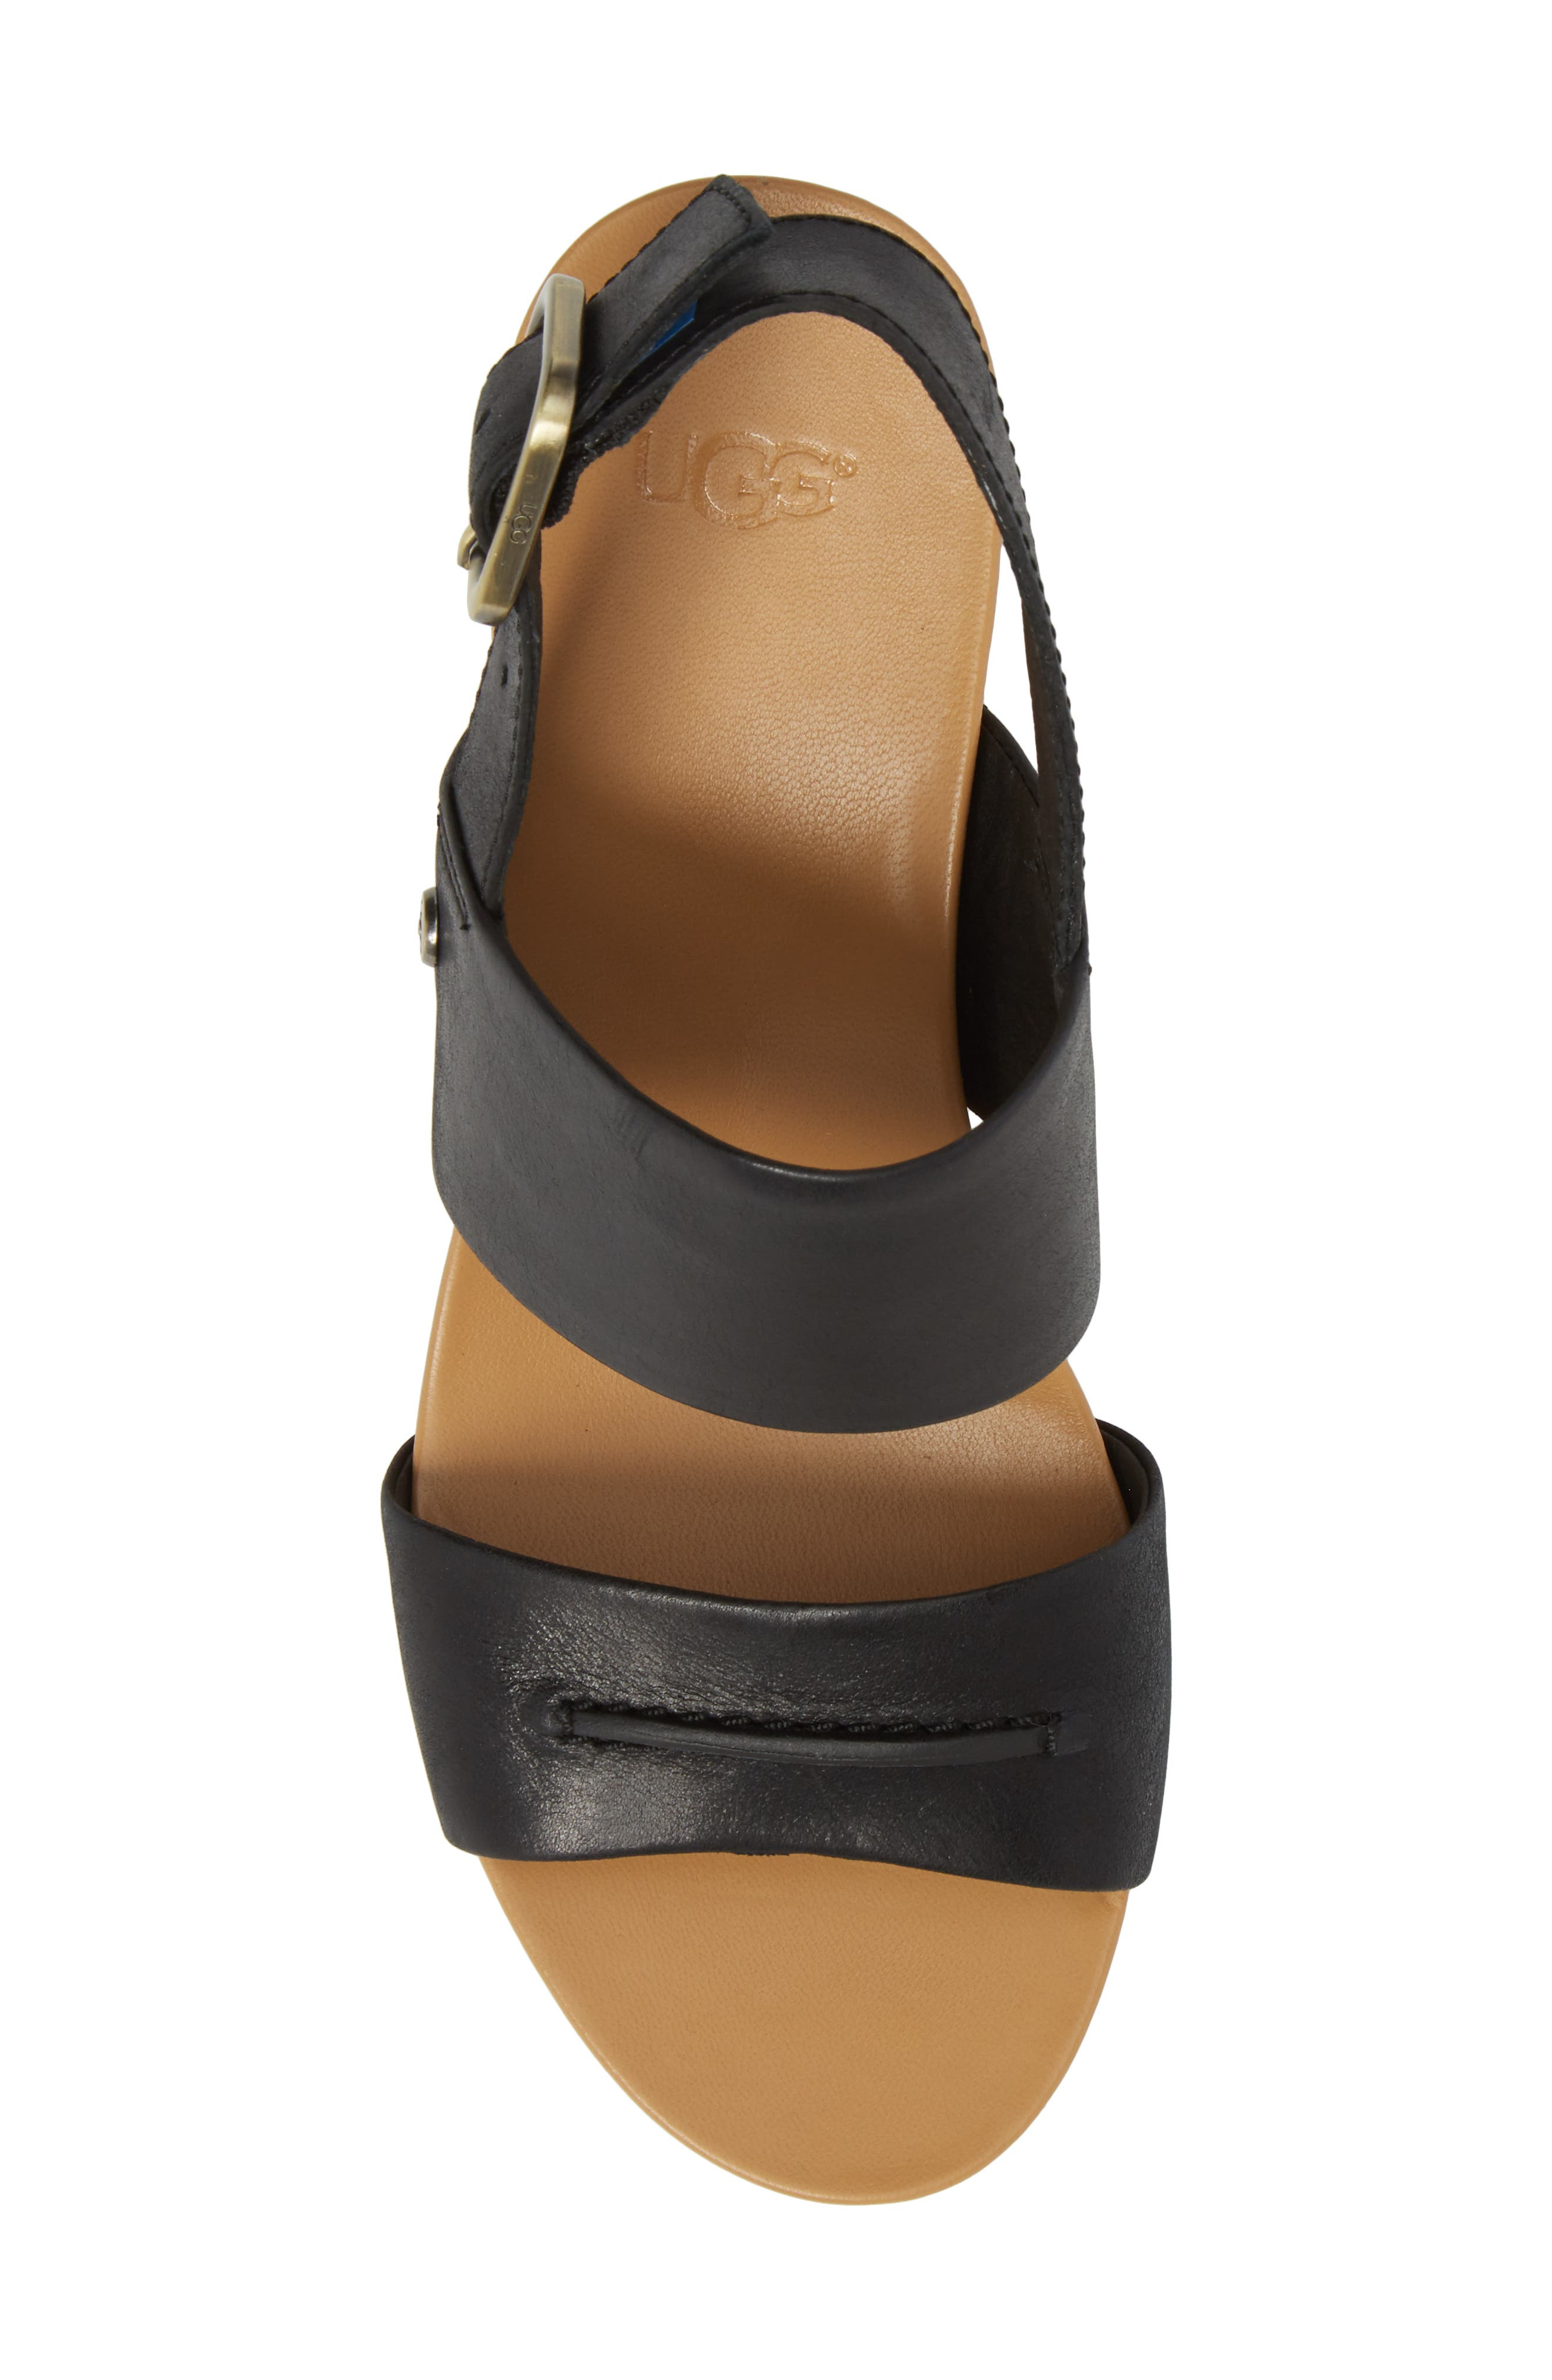 Elena II Platform Wedge Sandal,                             Alternate thumbnail 5, color,                             001